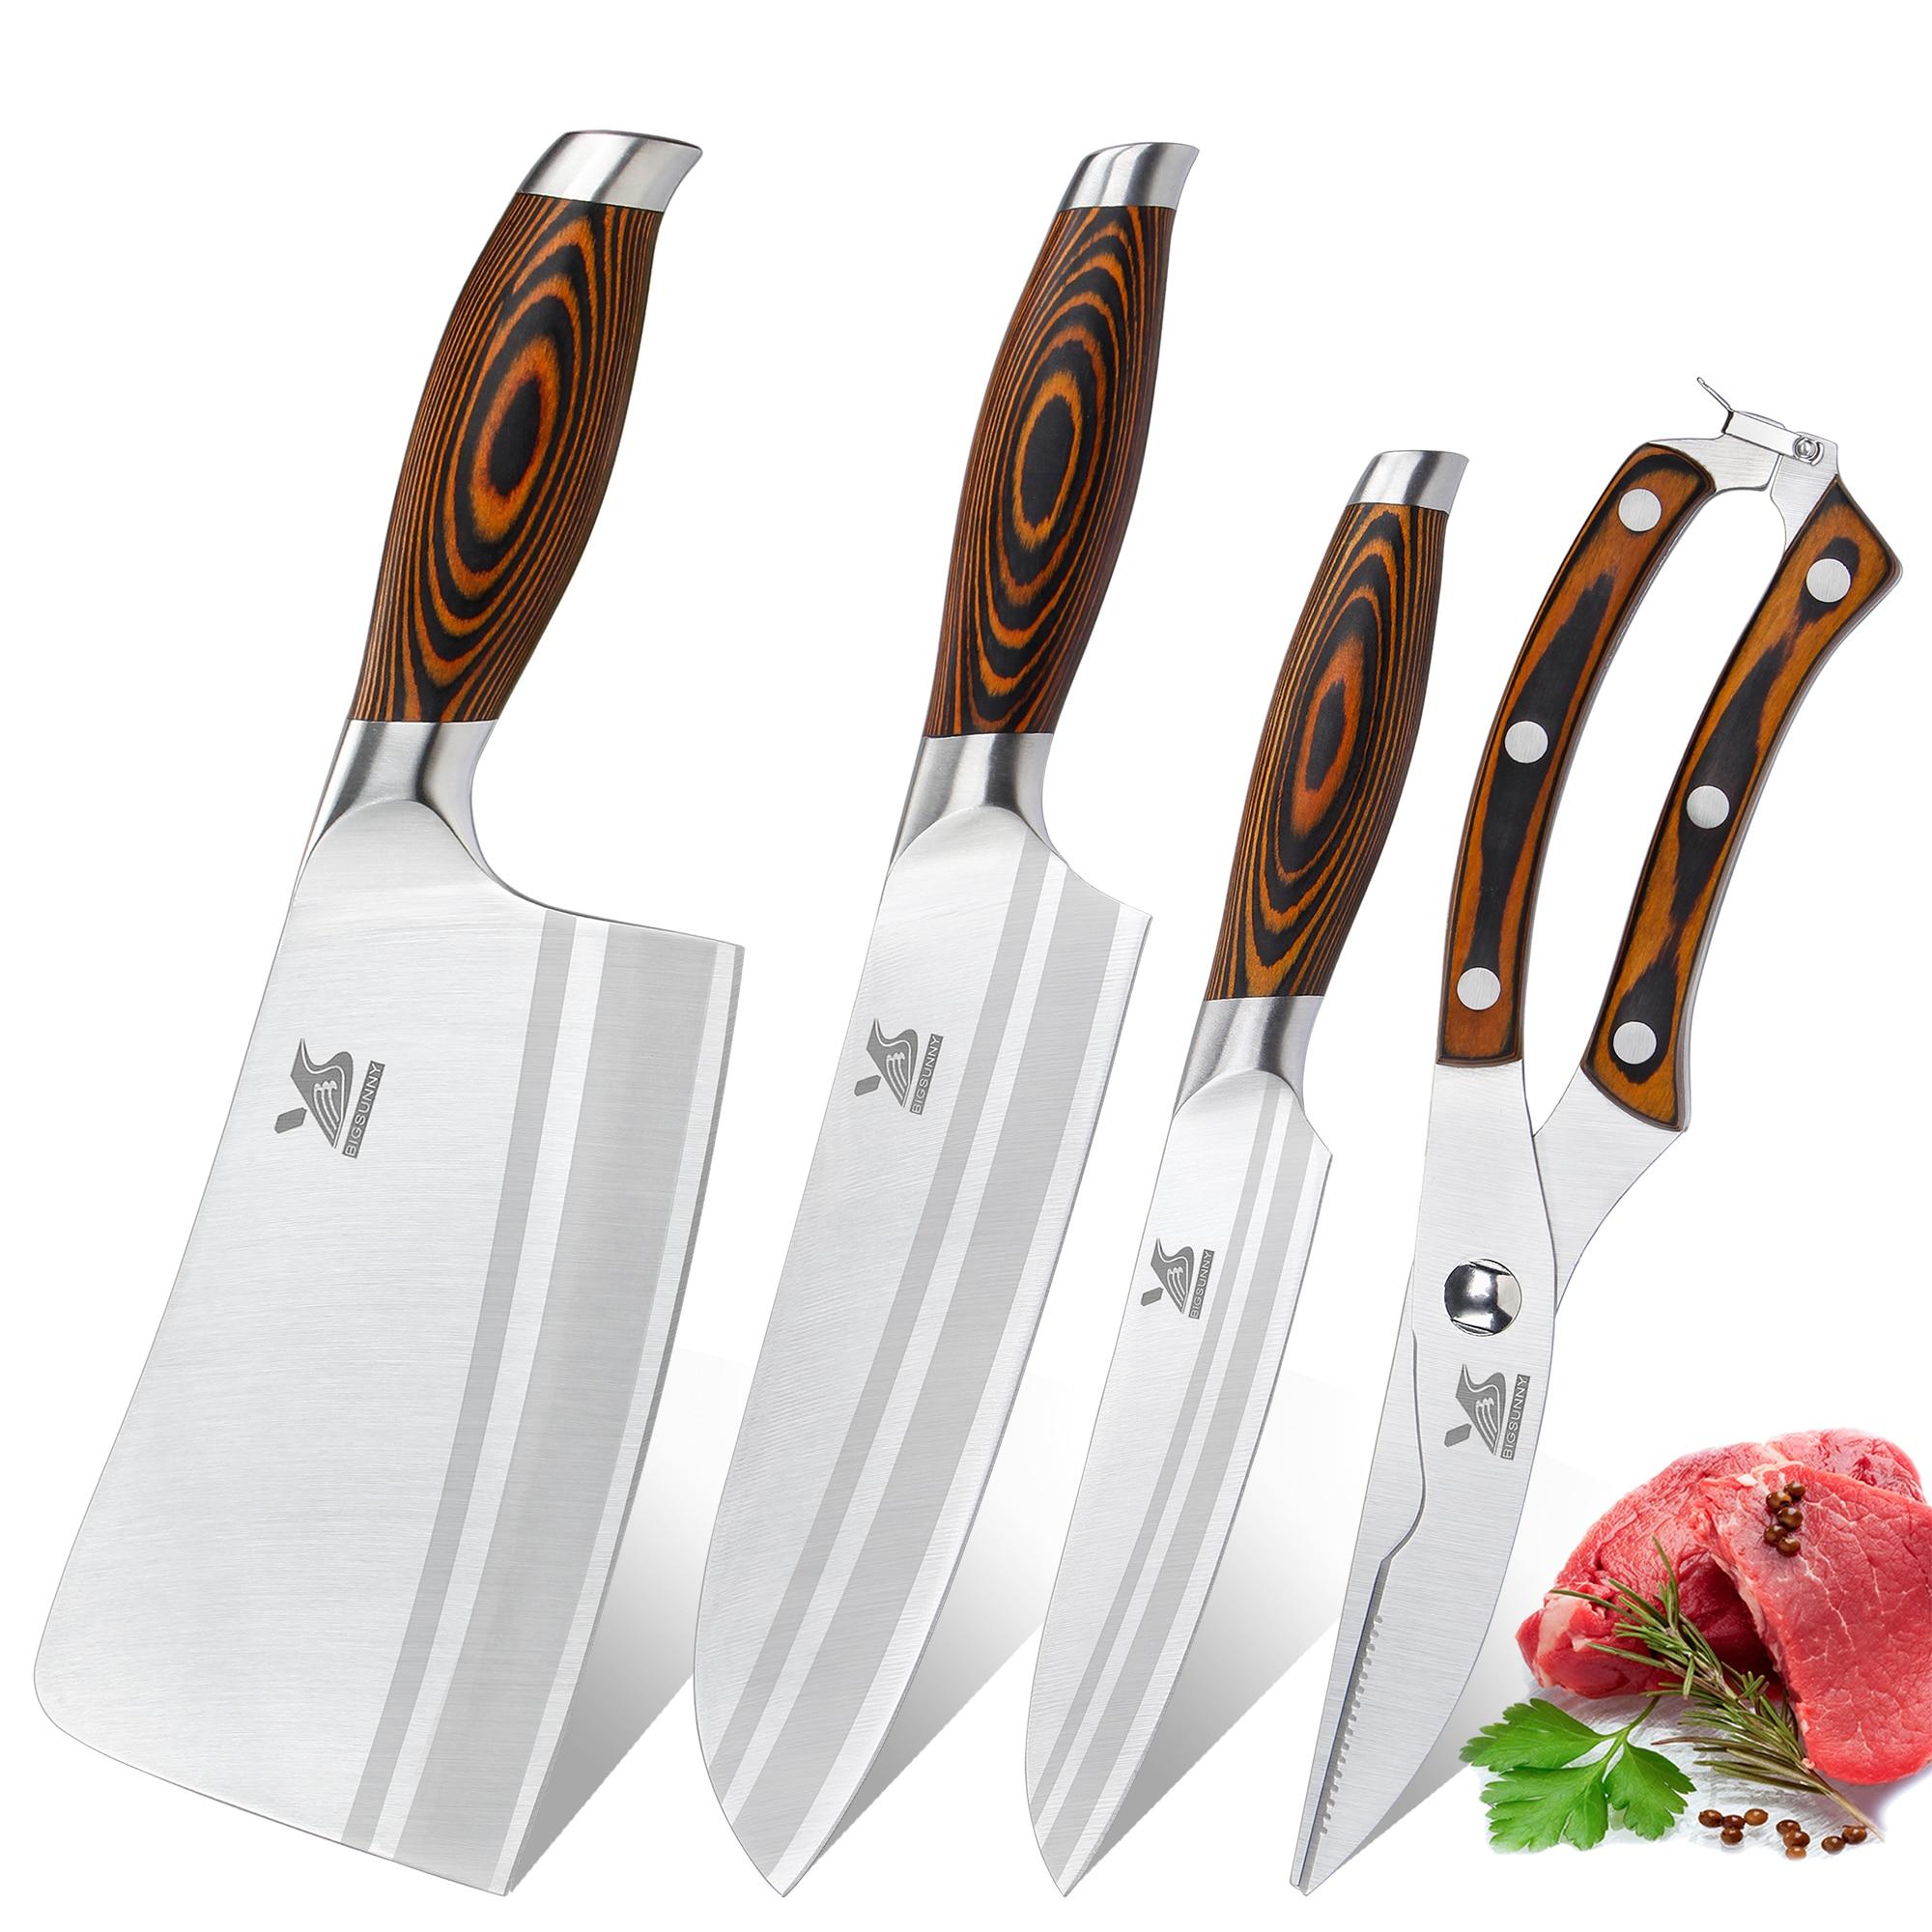 BIGSUNNY 4 Pcs Kitchen Knife Set 7